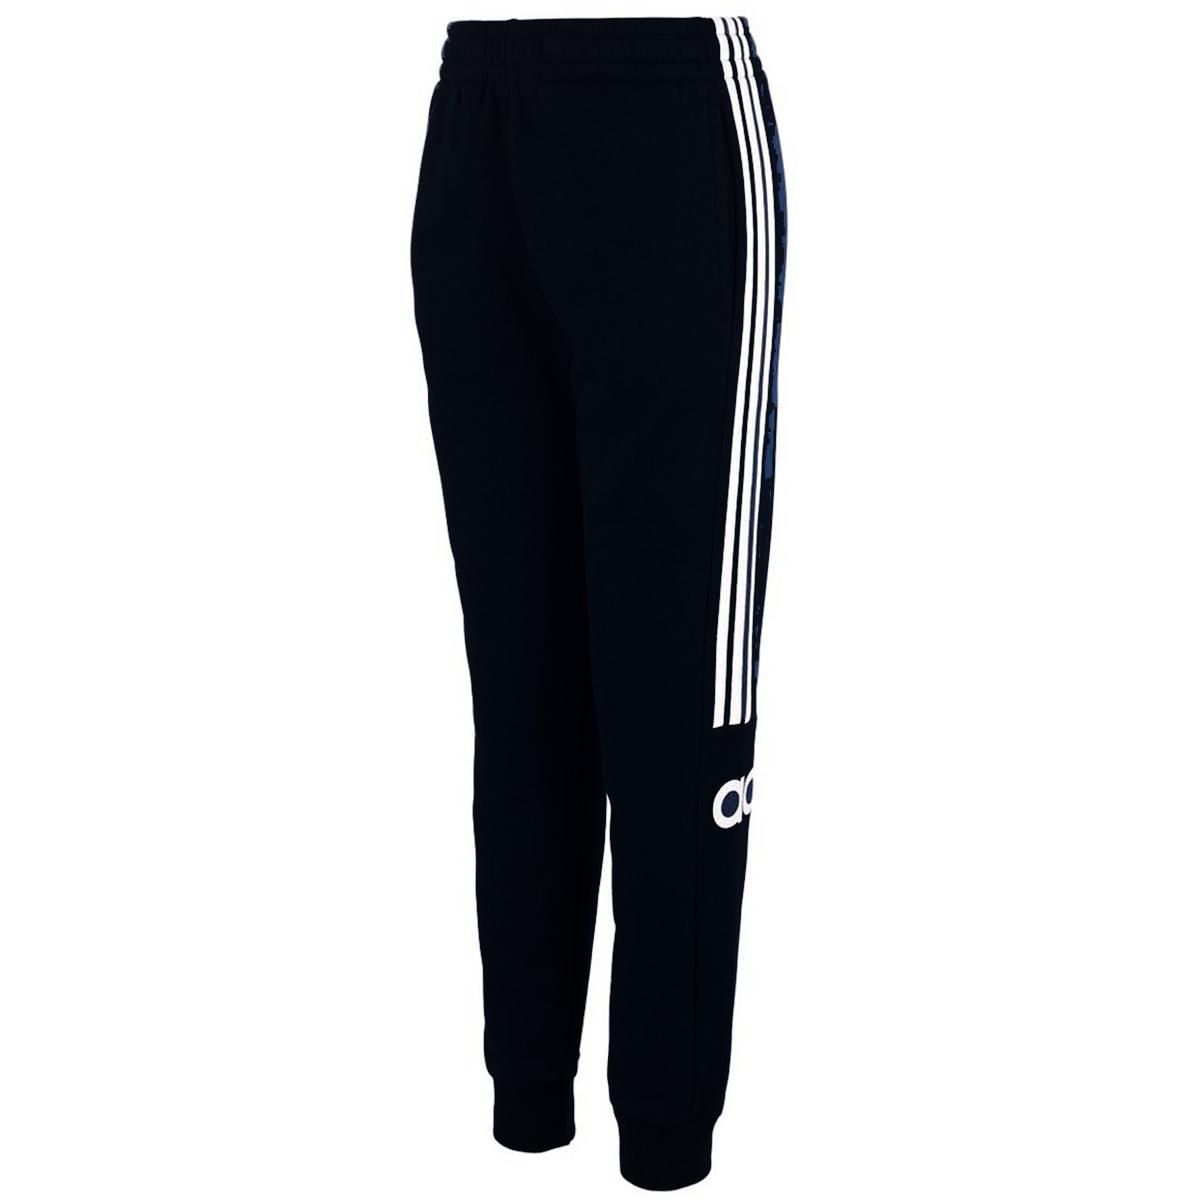 Adidas Boys' Core Linear Jogger Pants - Black, L